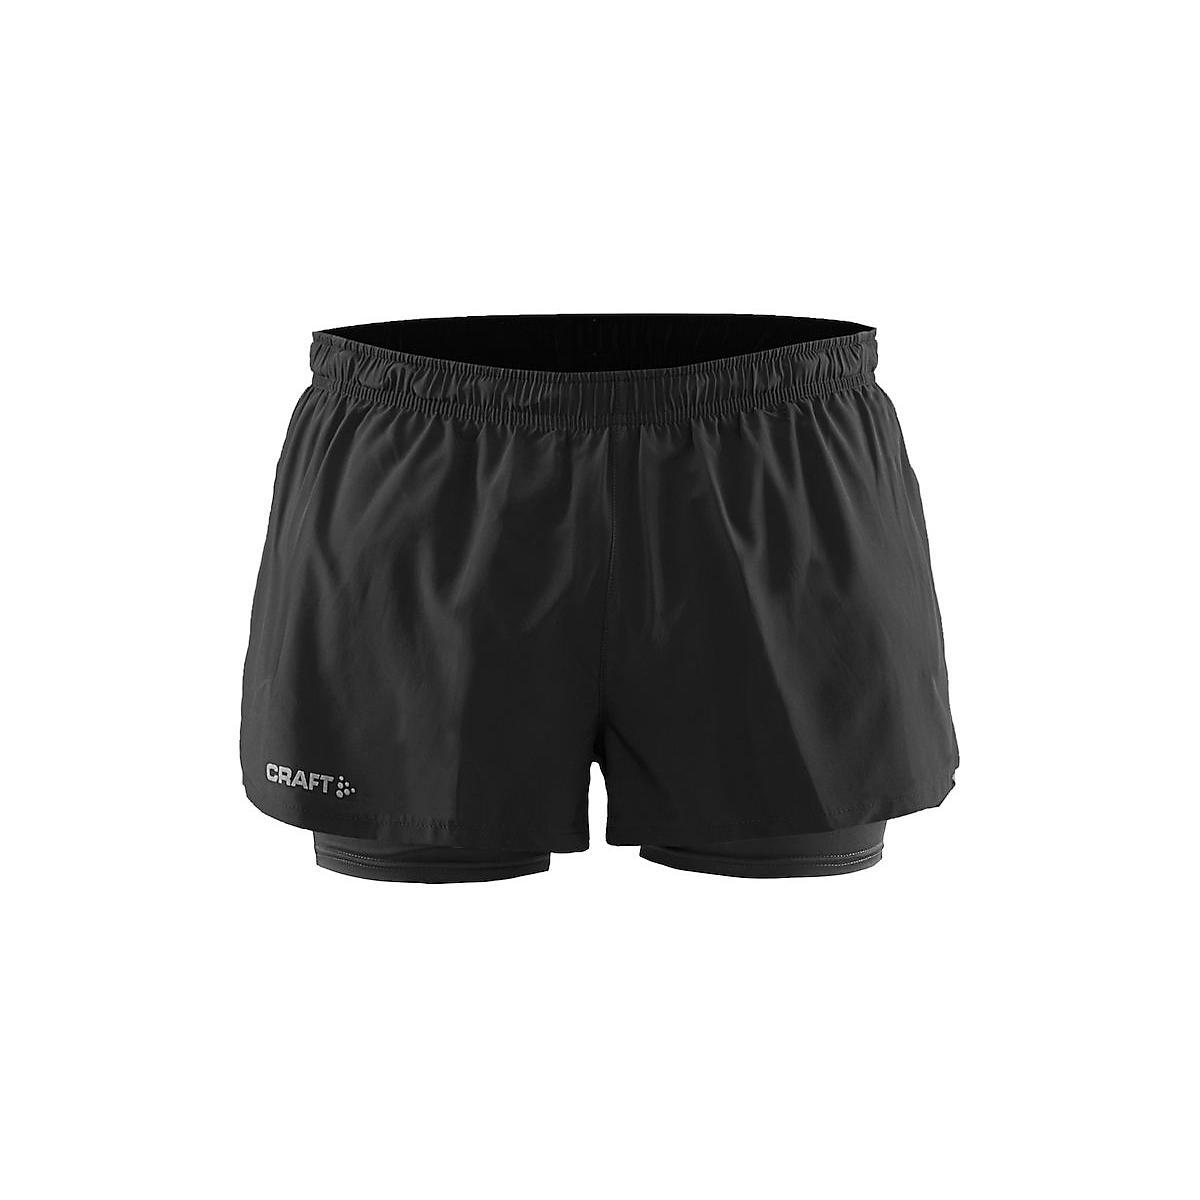 Women's Craft�Focus 2-in-1 shorts